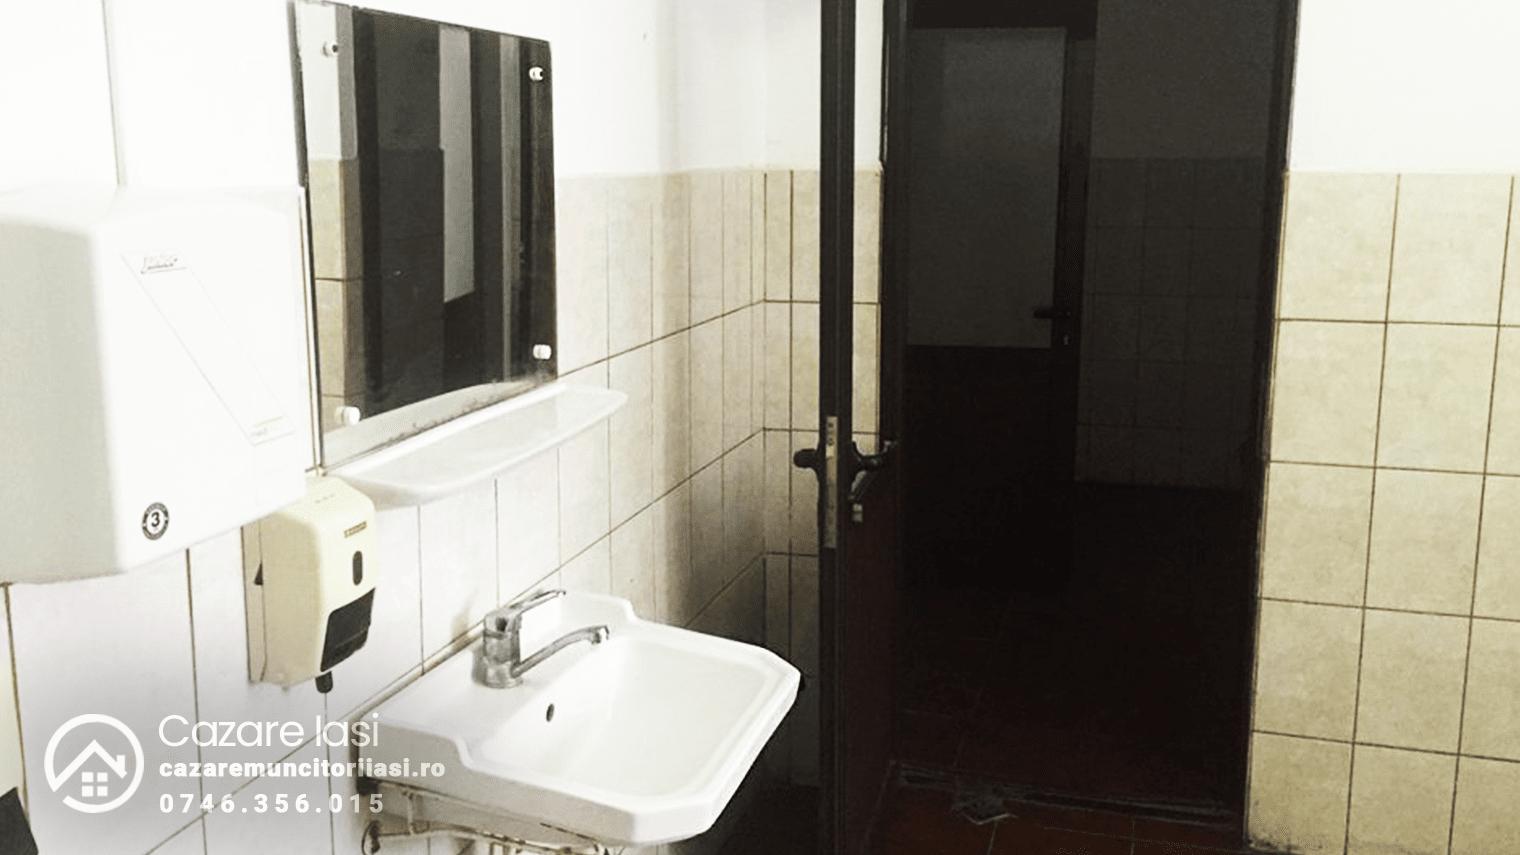 baie locatie hostel Iasi 4x